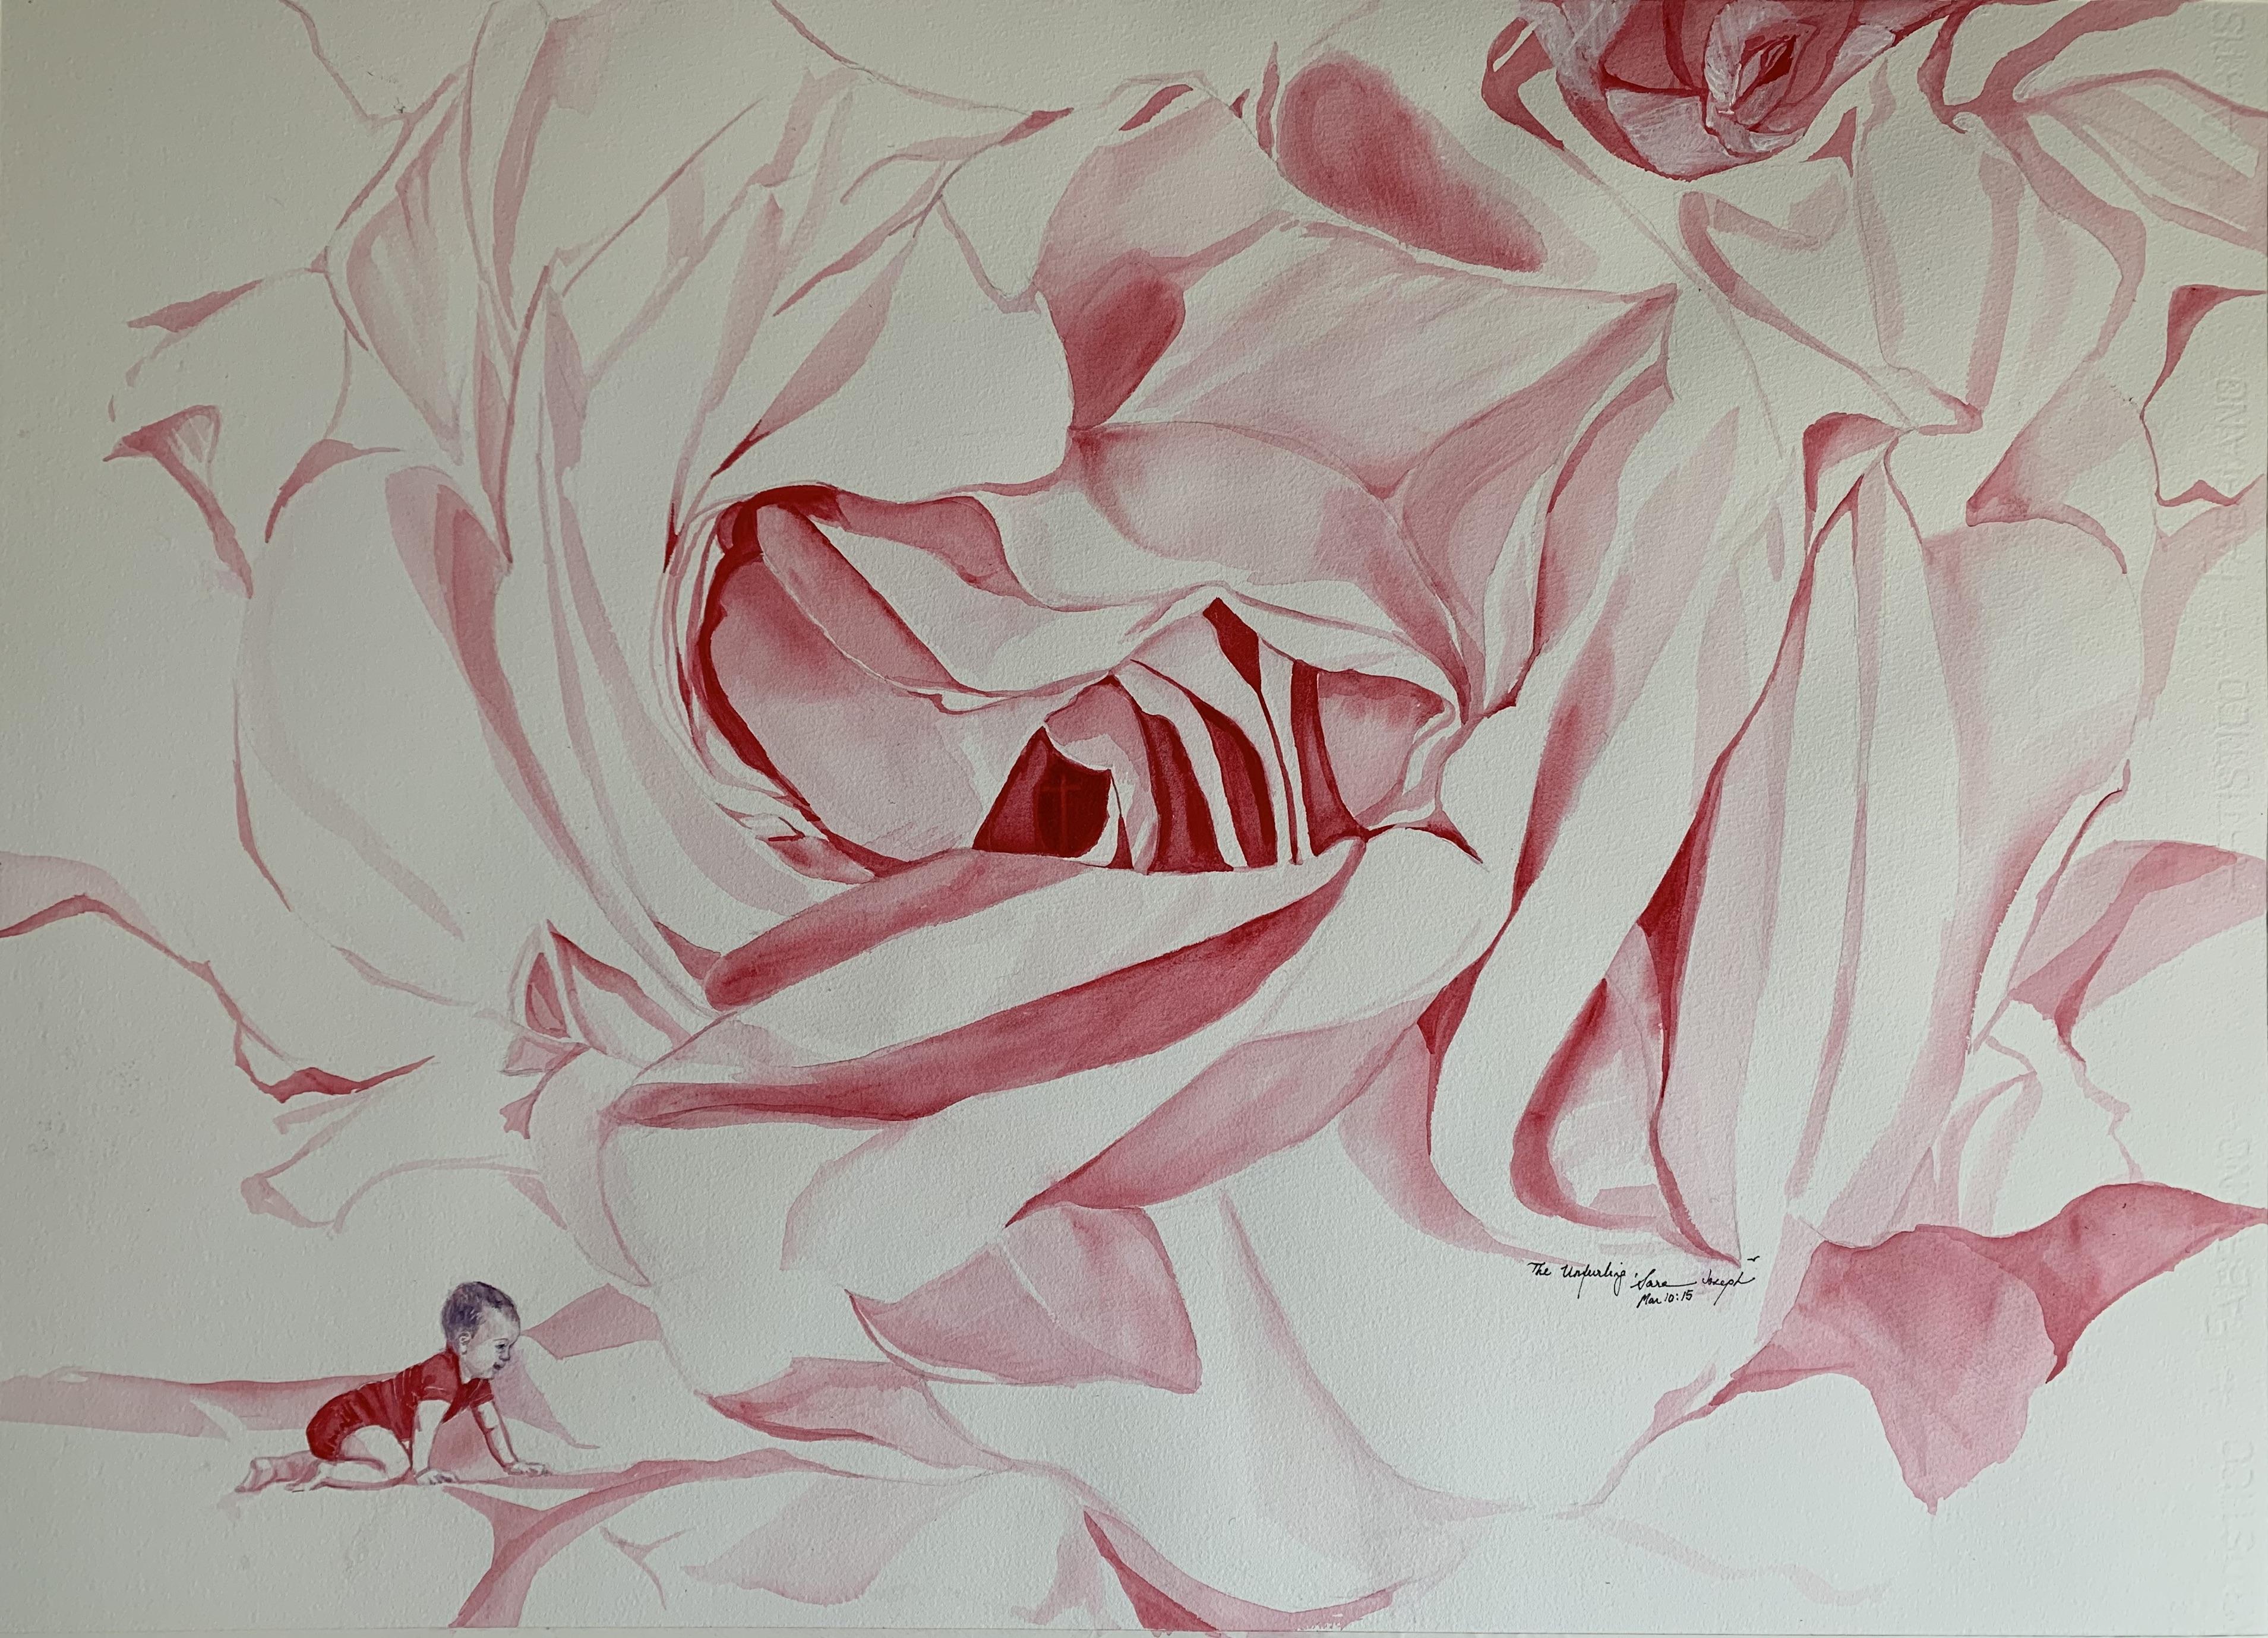 The Unfurling, Watercolor